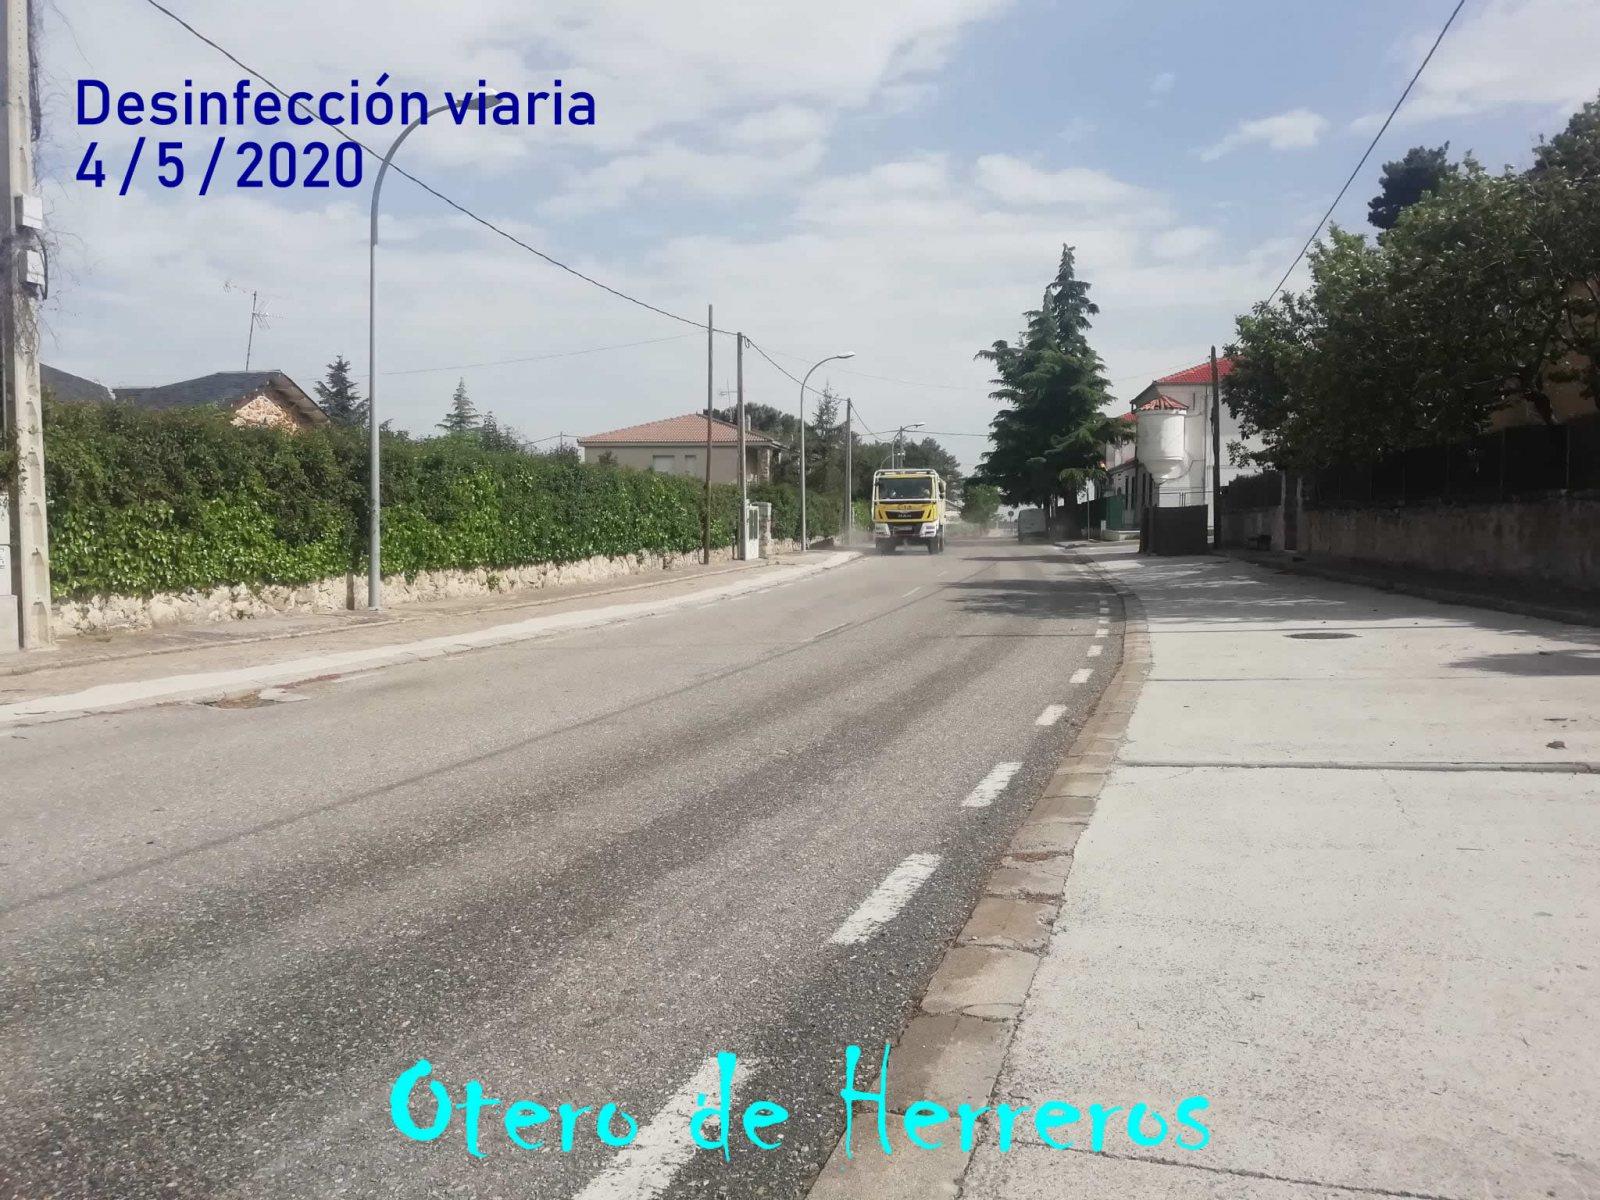 PHOTO-2020-05-04-11-13-06-copia-2